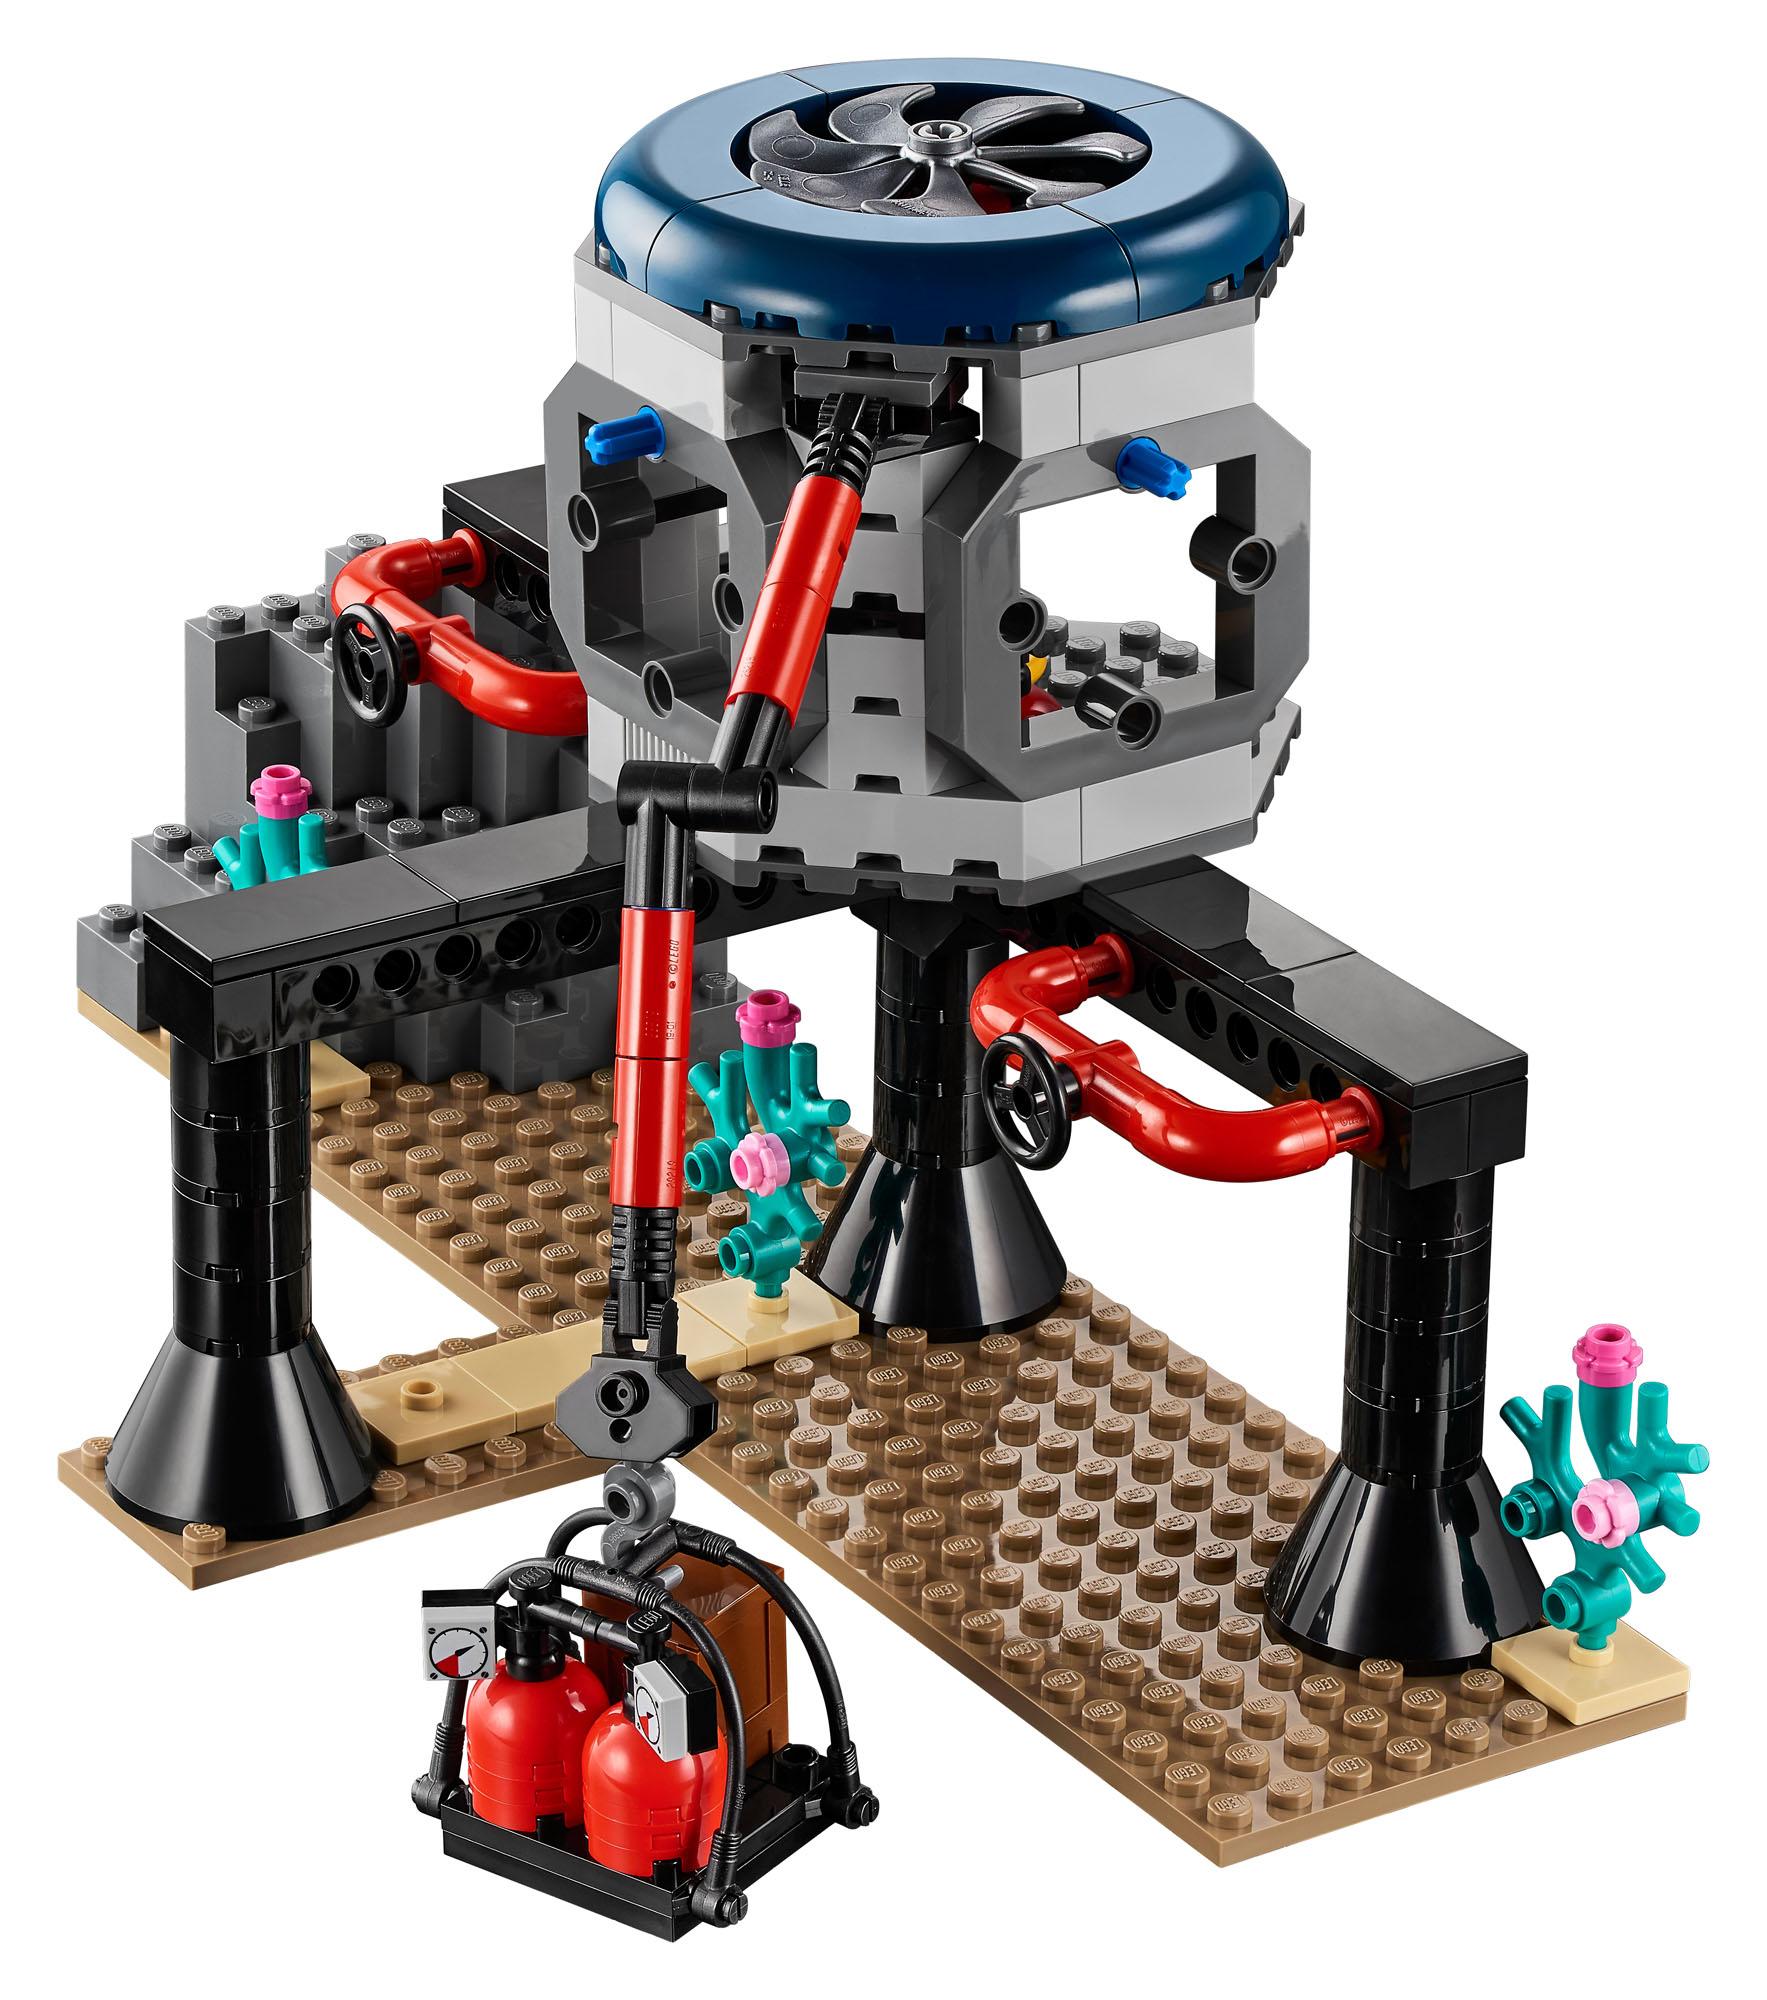 60265 LEGO City Ocean Exploration Base Playset 497 Pieces ...